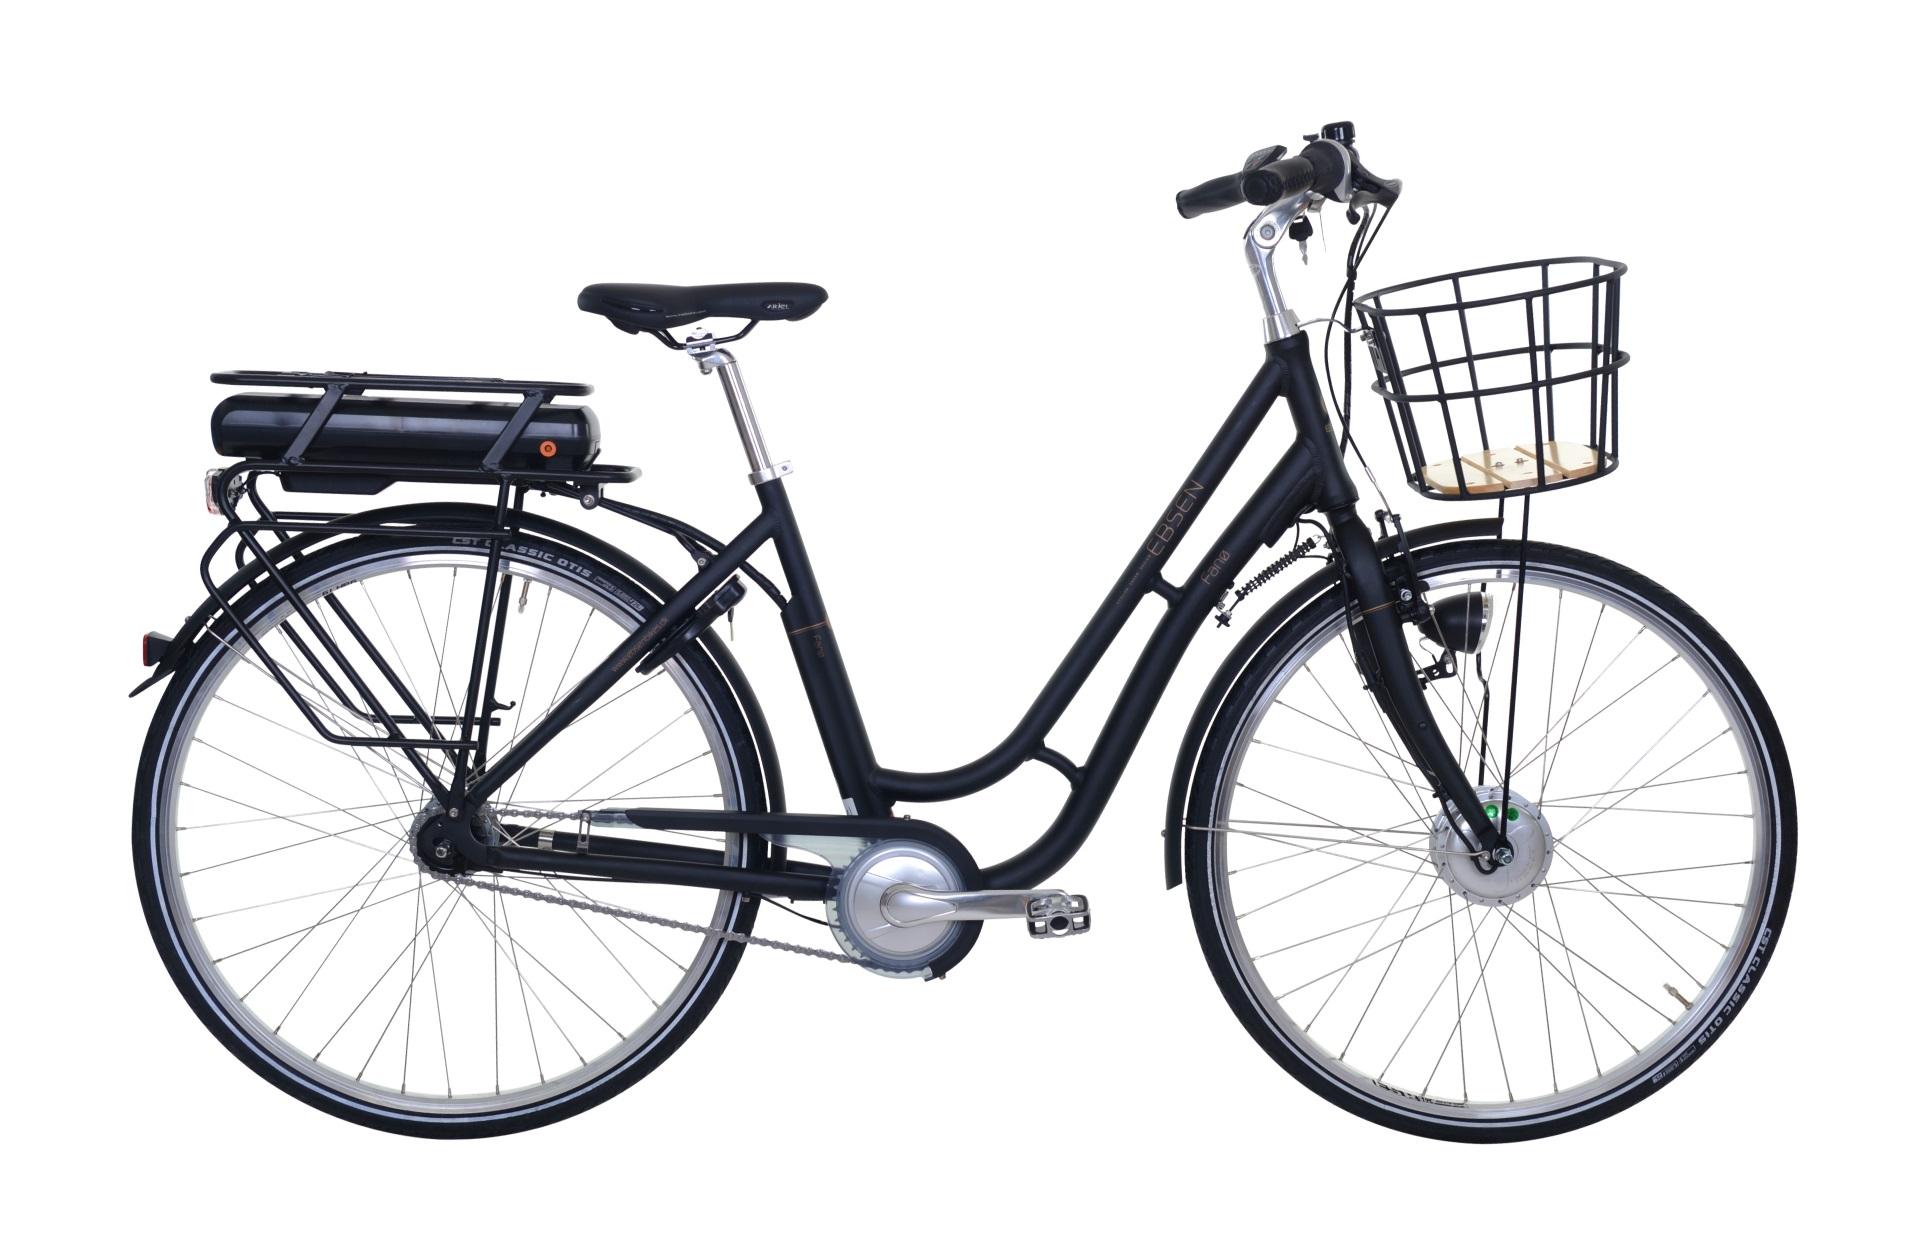 Ebsen Fanø Retro Dame Elcykel 7 Gear Matsort 50Cm - 2019 Mærker